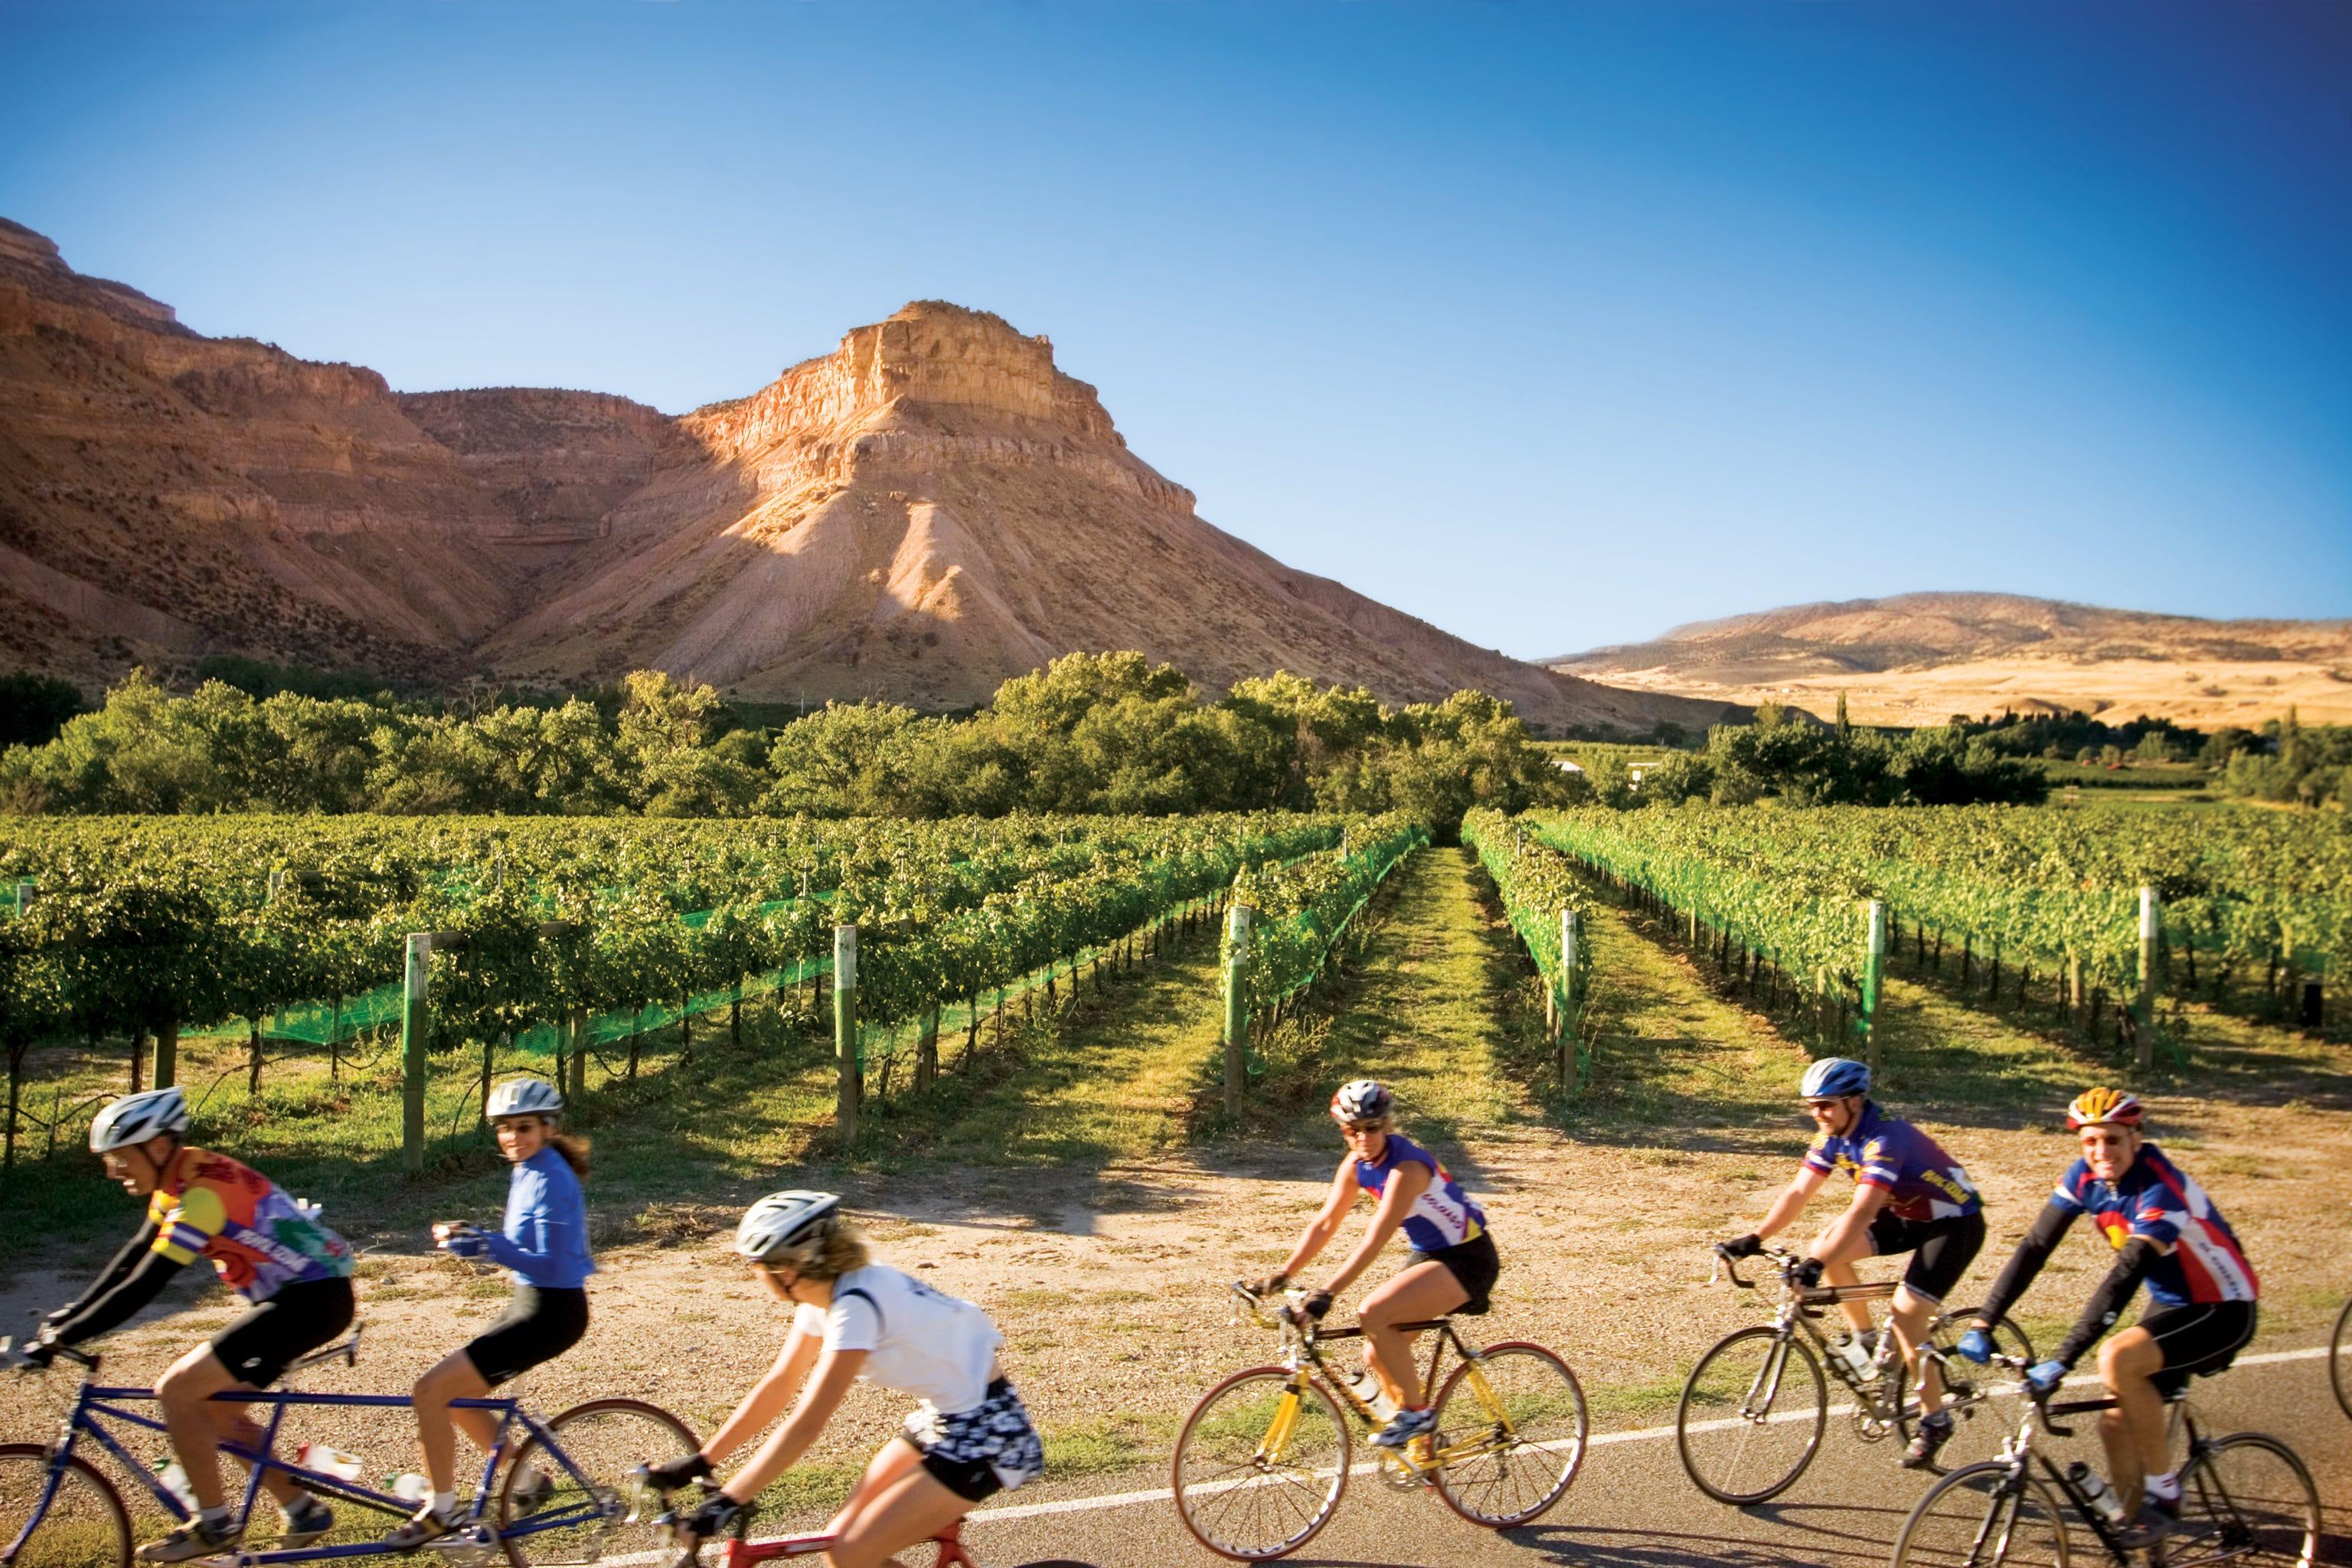 Beyond Sonoma: Check out wine country in Oregon, Colorado, Virginia and Pennsylvania